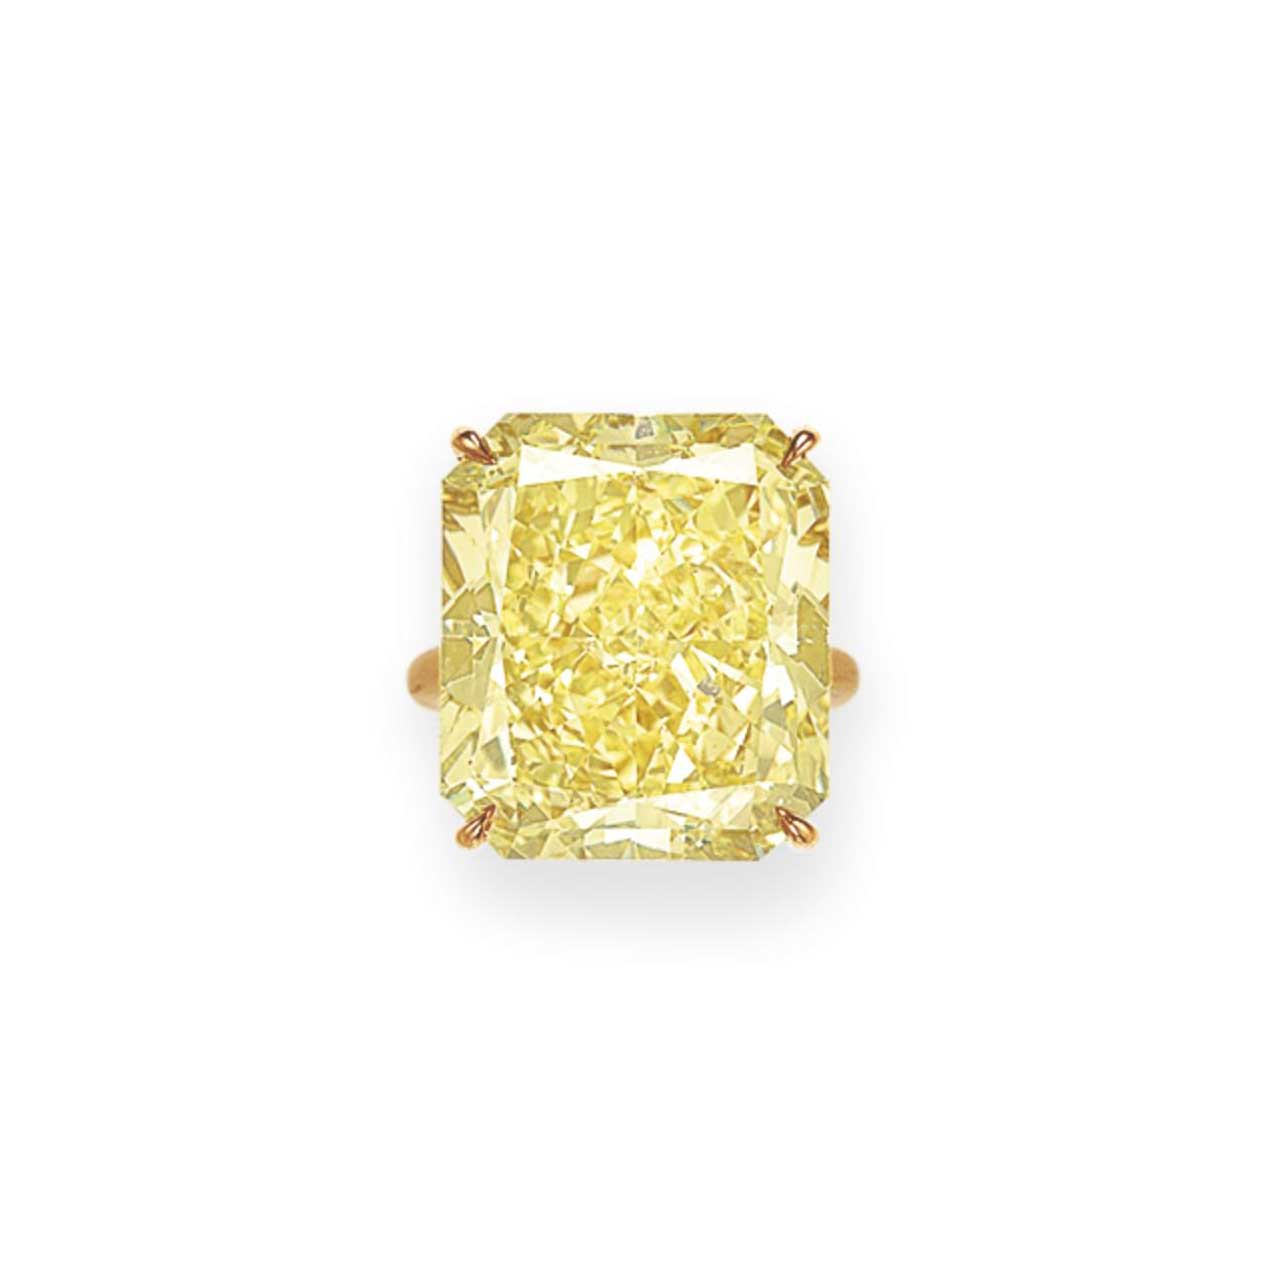 AN IMPRESSIVE COLORED DIAMOND RING